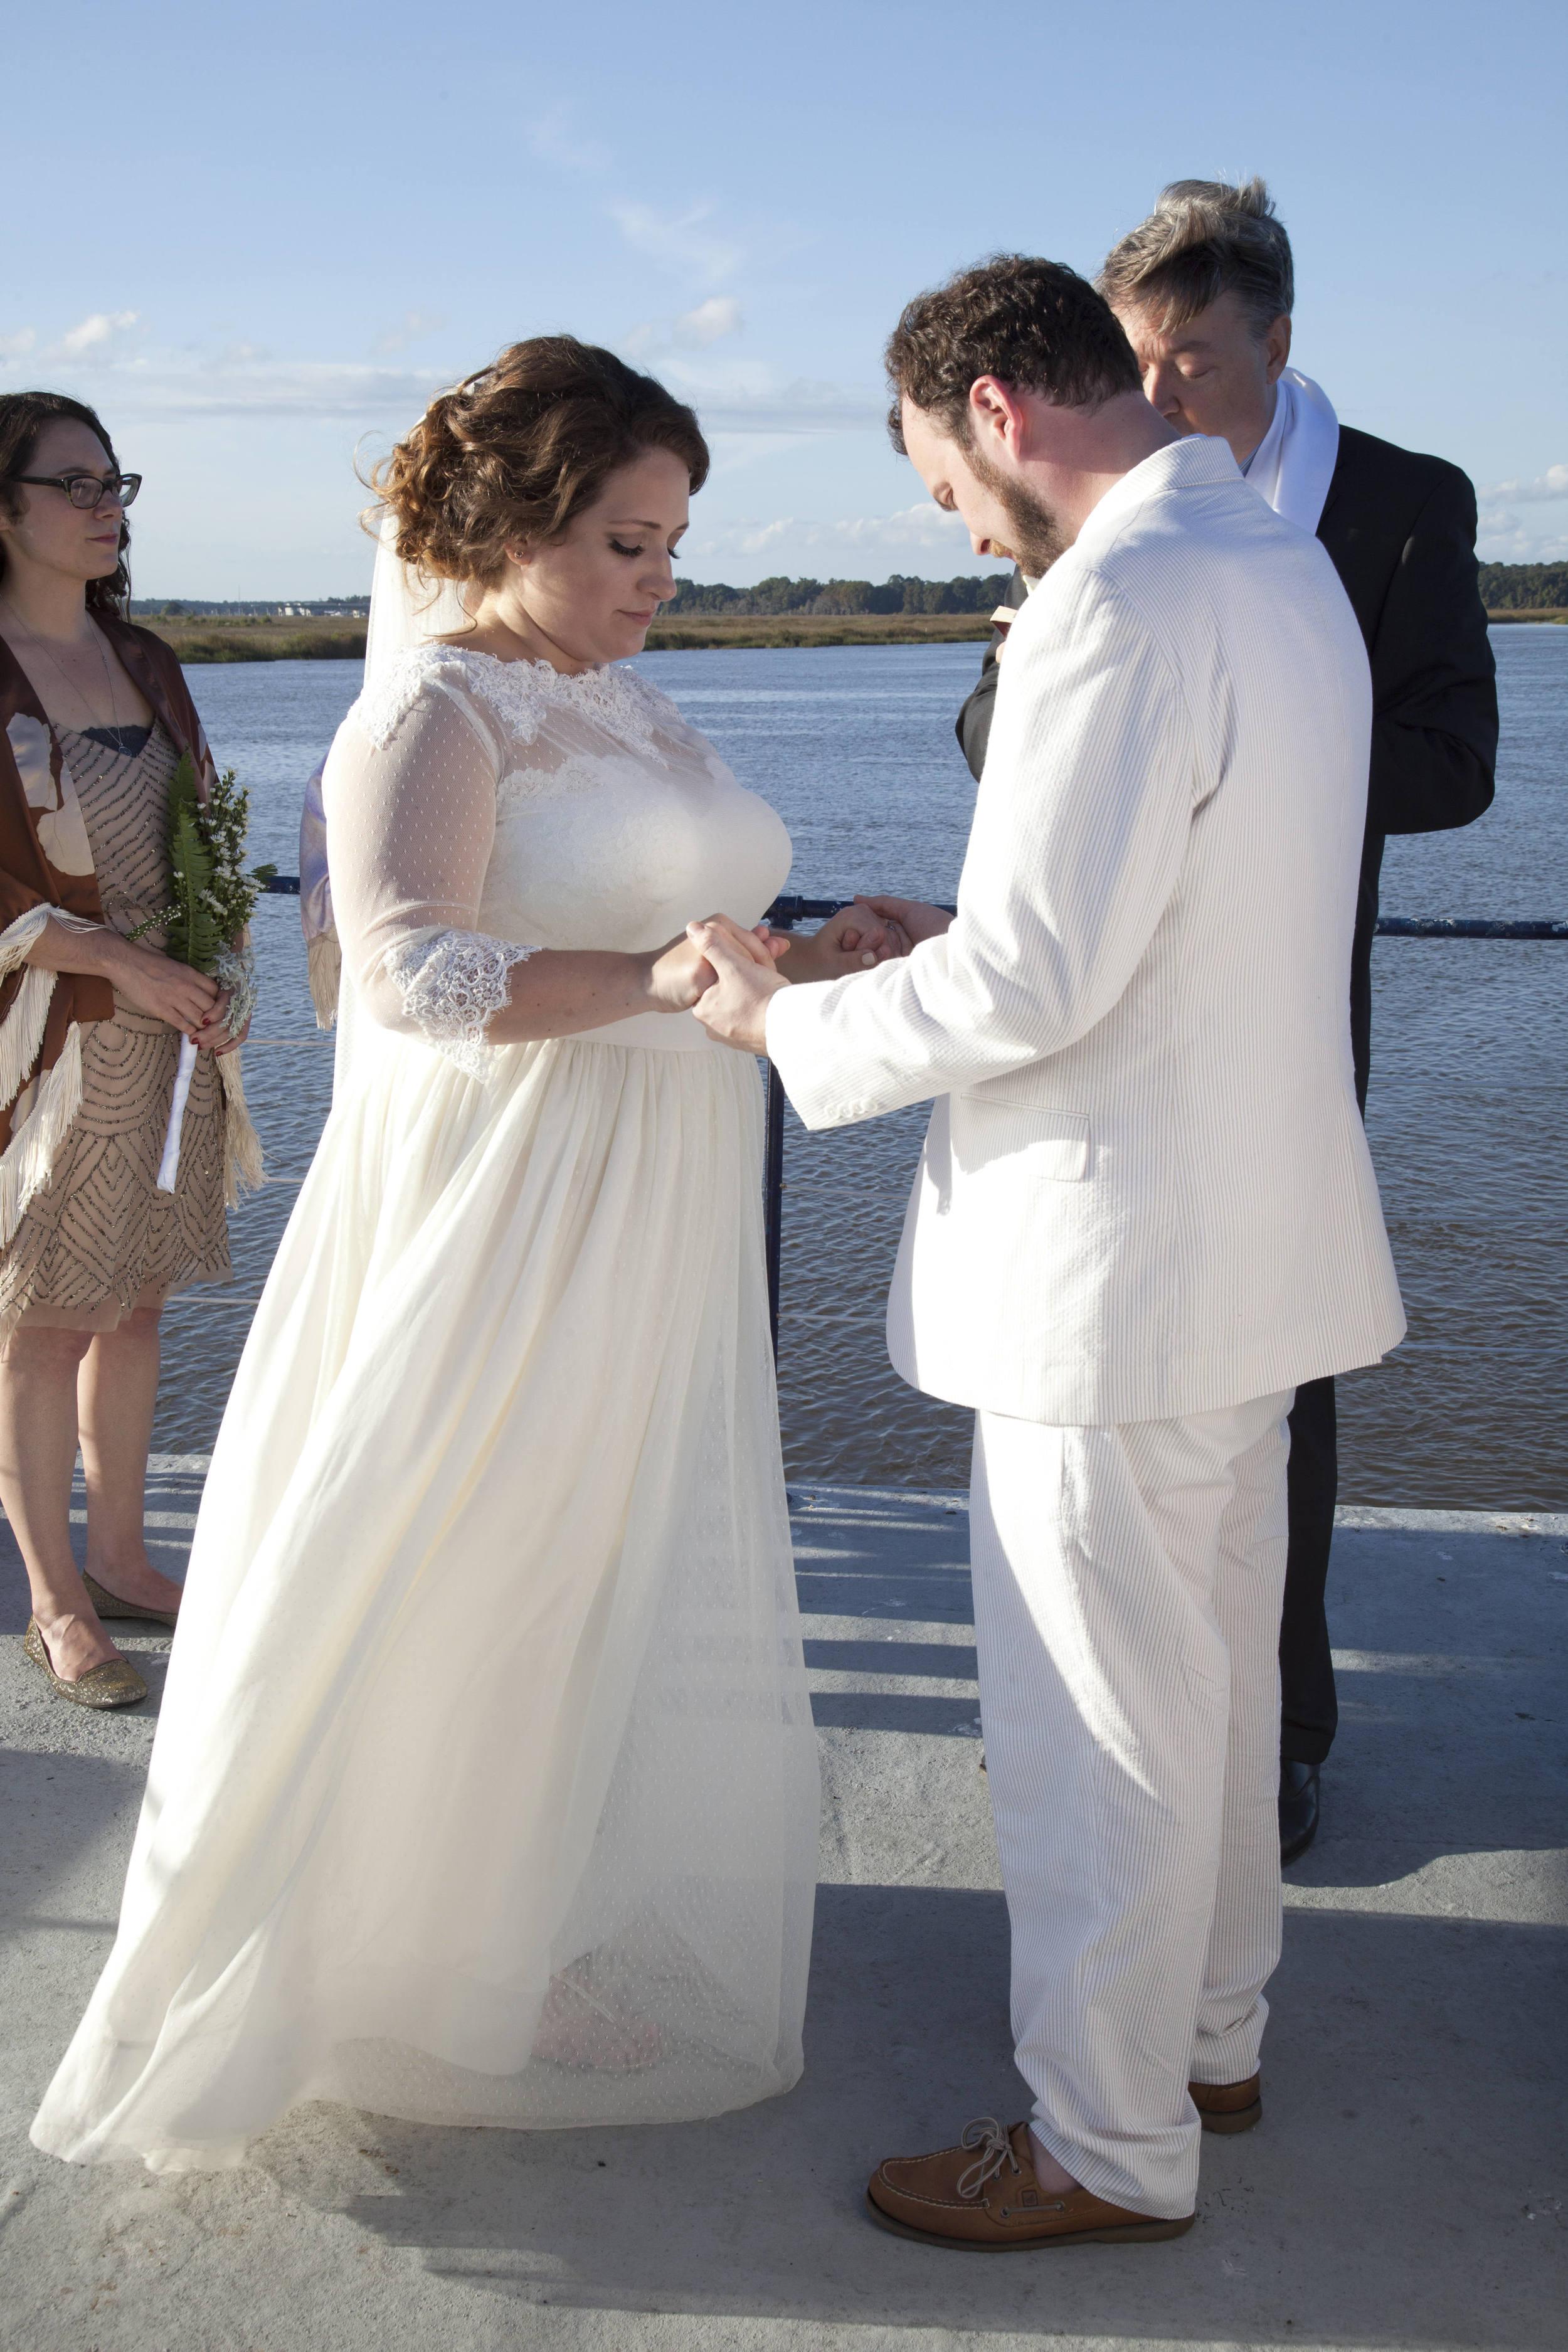 Caroline-Kilgore-photography-ivory-and-beau-bridal-boutique-savannah-wedding-dresses-savannah-bridal-boutique-savannah-wedding-gowns-custom-wedding-dress-vintage-wedding-dress-swiss-dot-wedding-dress-shrimp-boat-wedding-7.JPG